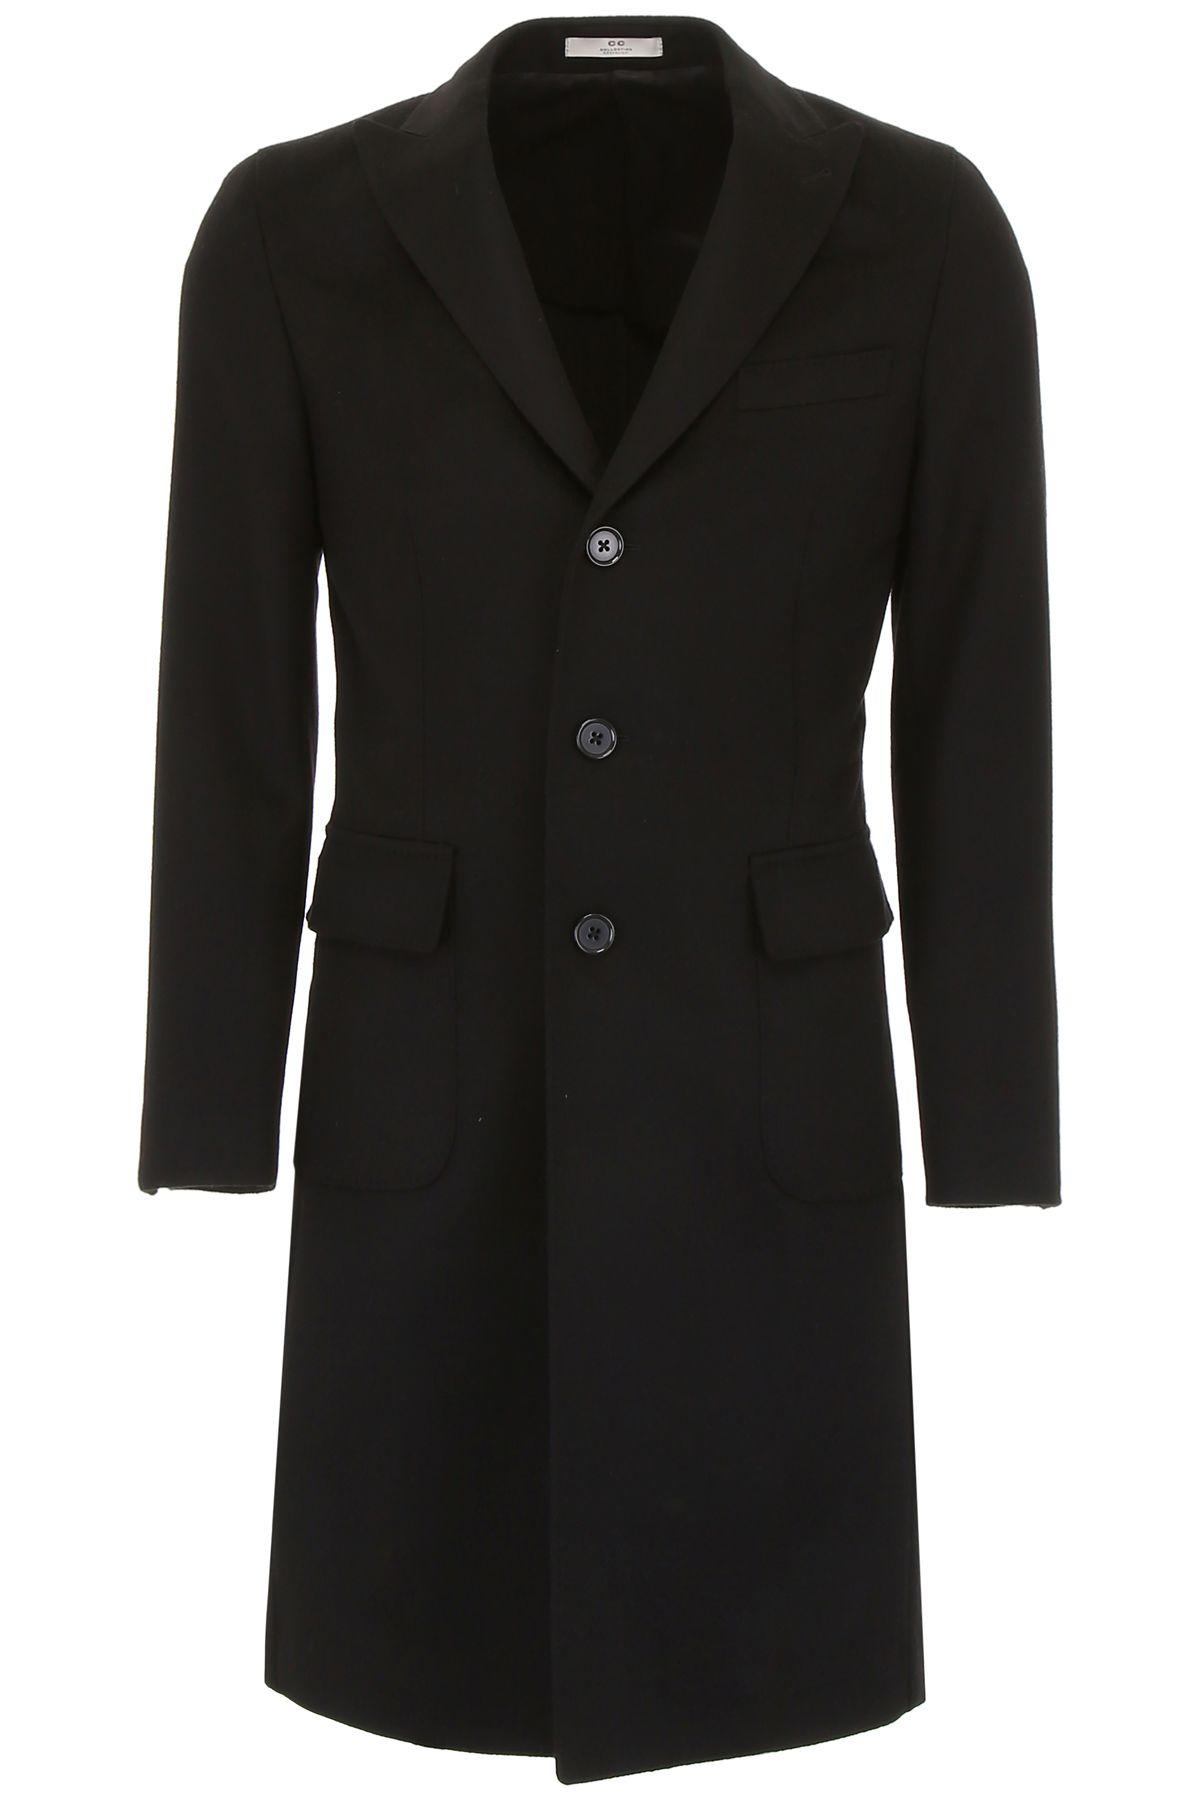 CC COLLECTION CORNELIANI Wool Coat in Black